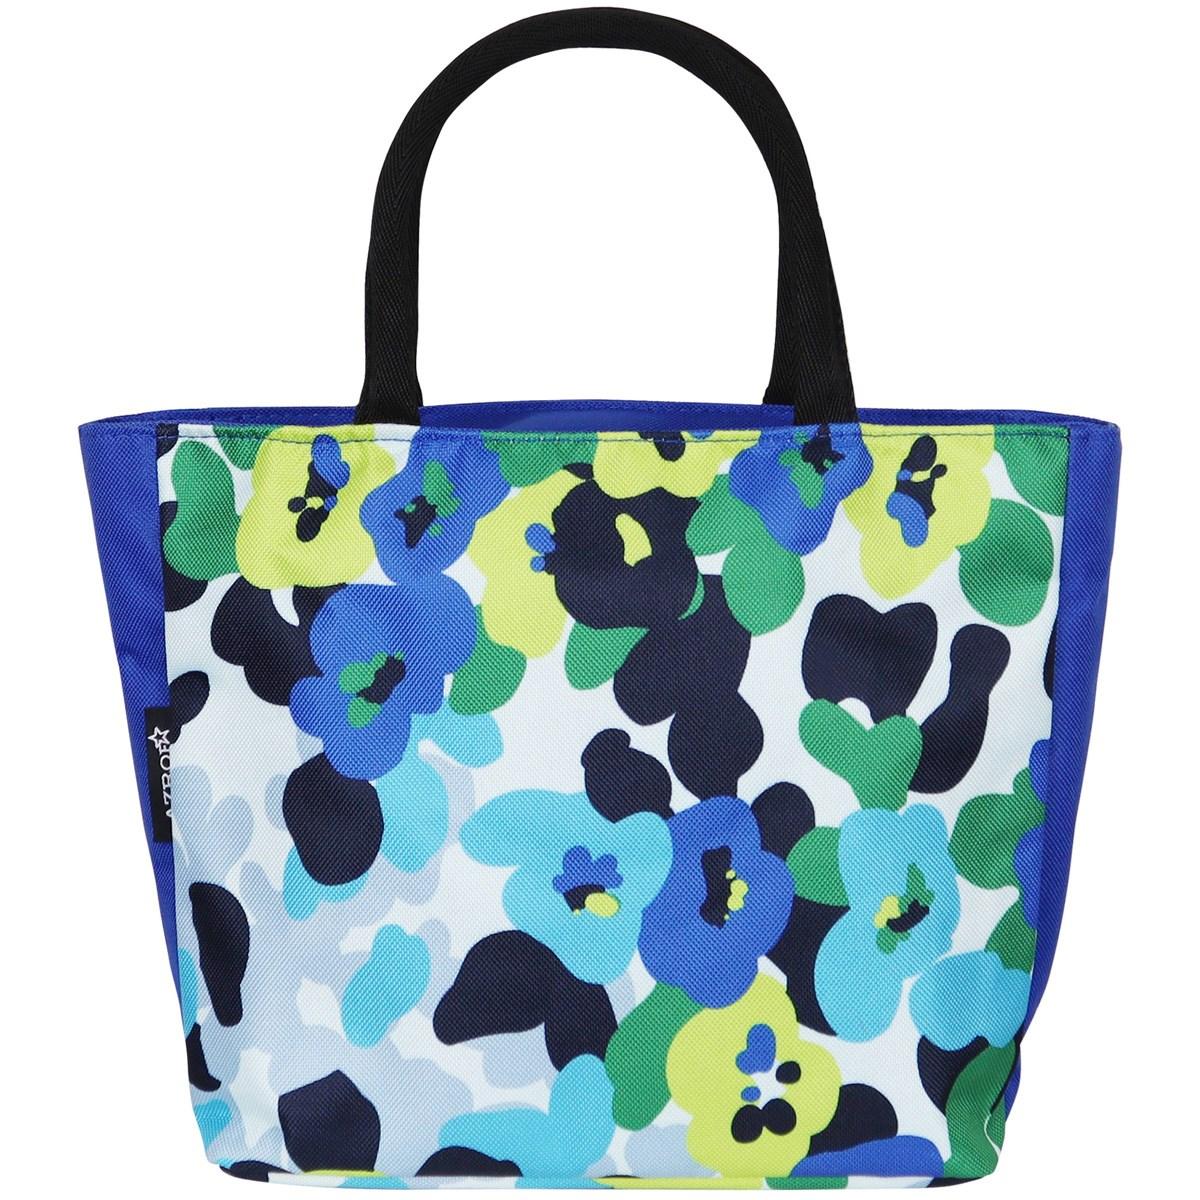 AZROF ミニトートバッグ フラワーブルー